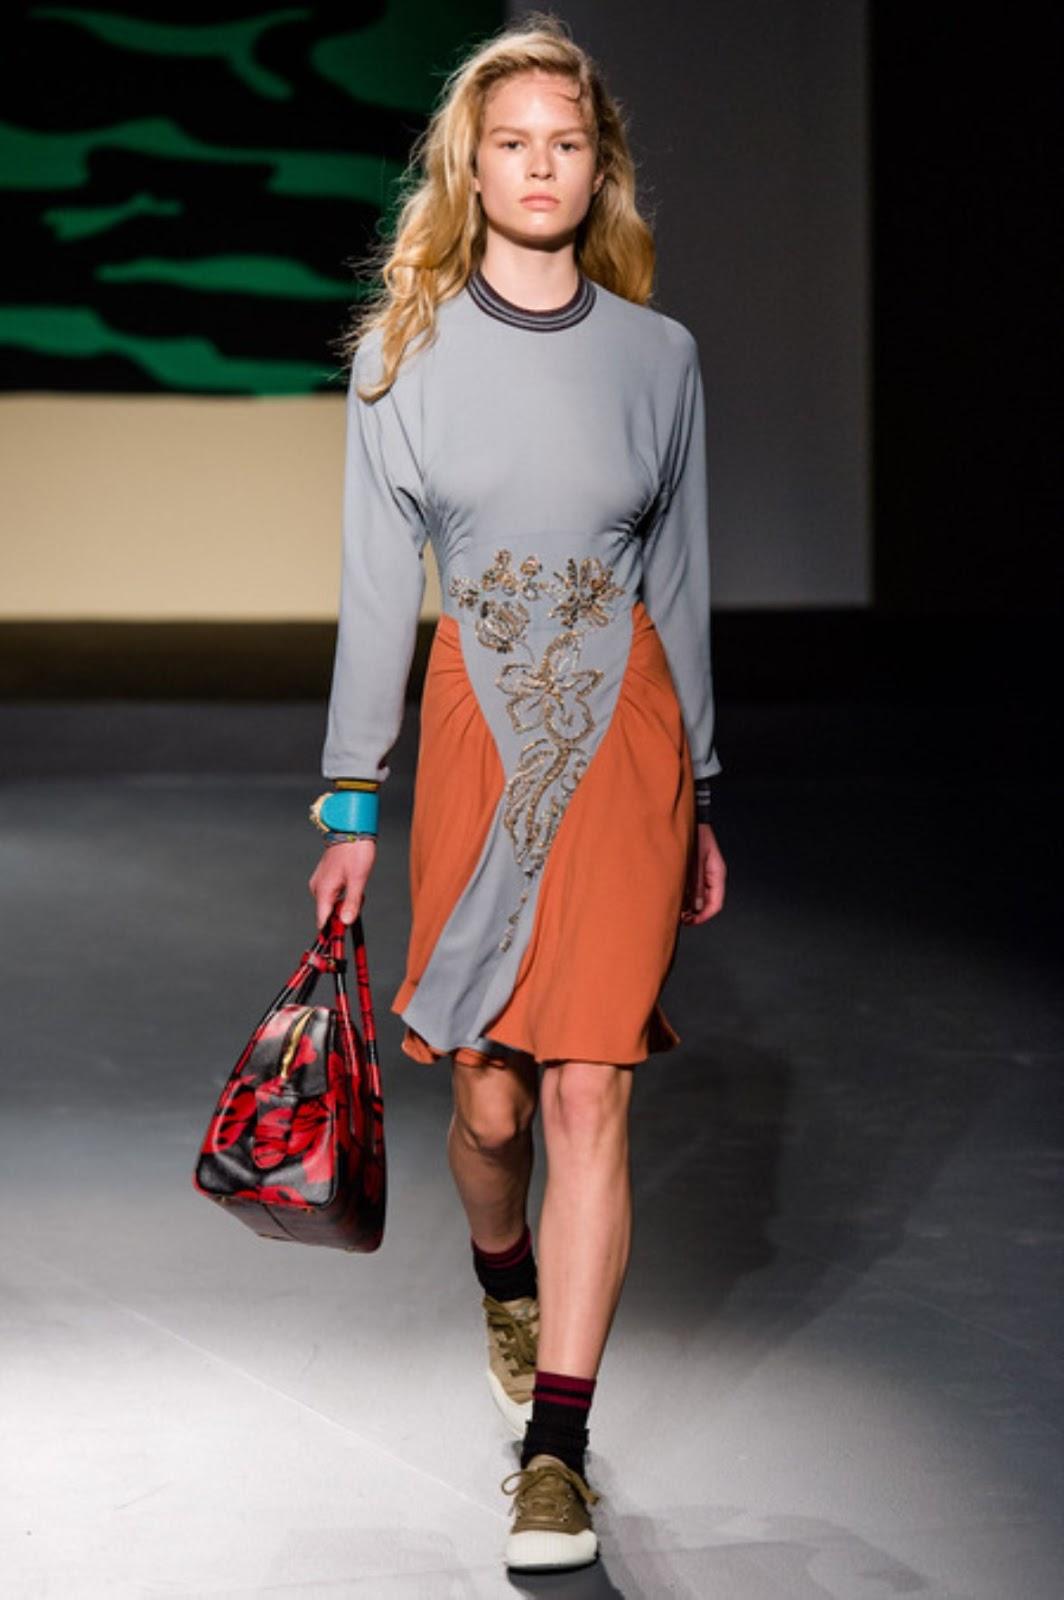 Anna ewers marc jacobs fashion show fw 2014 new york mq runway candids